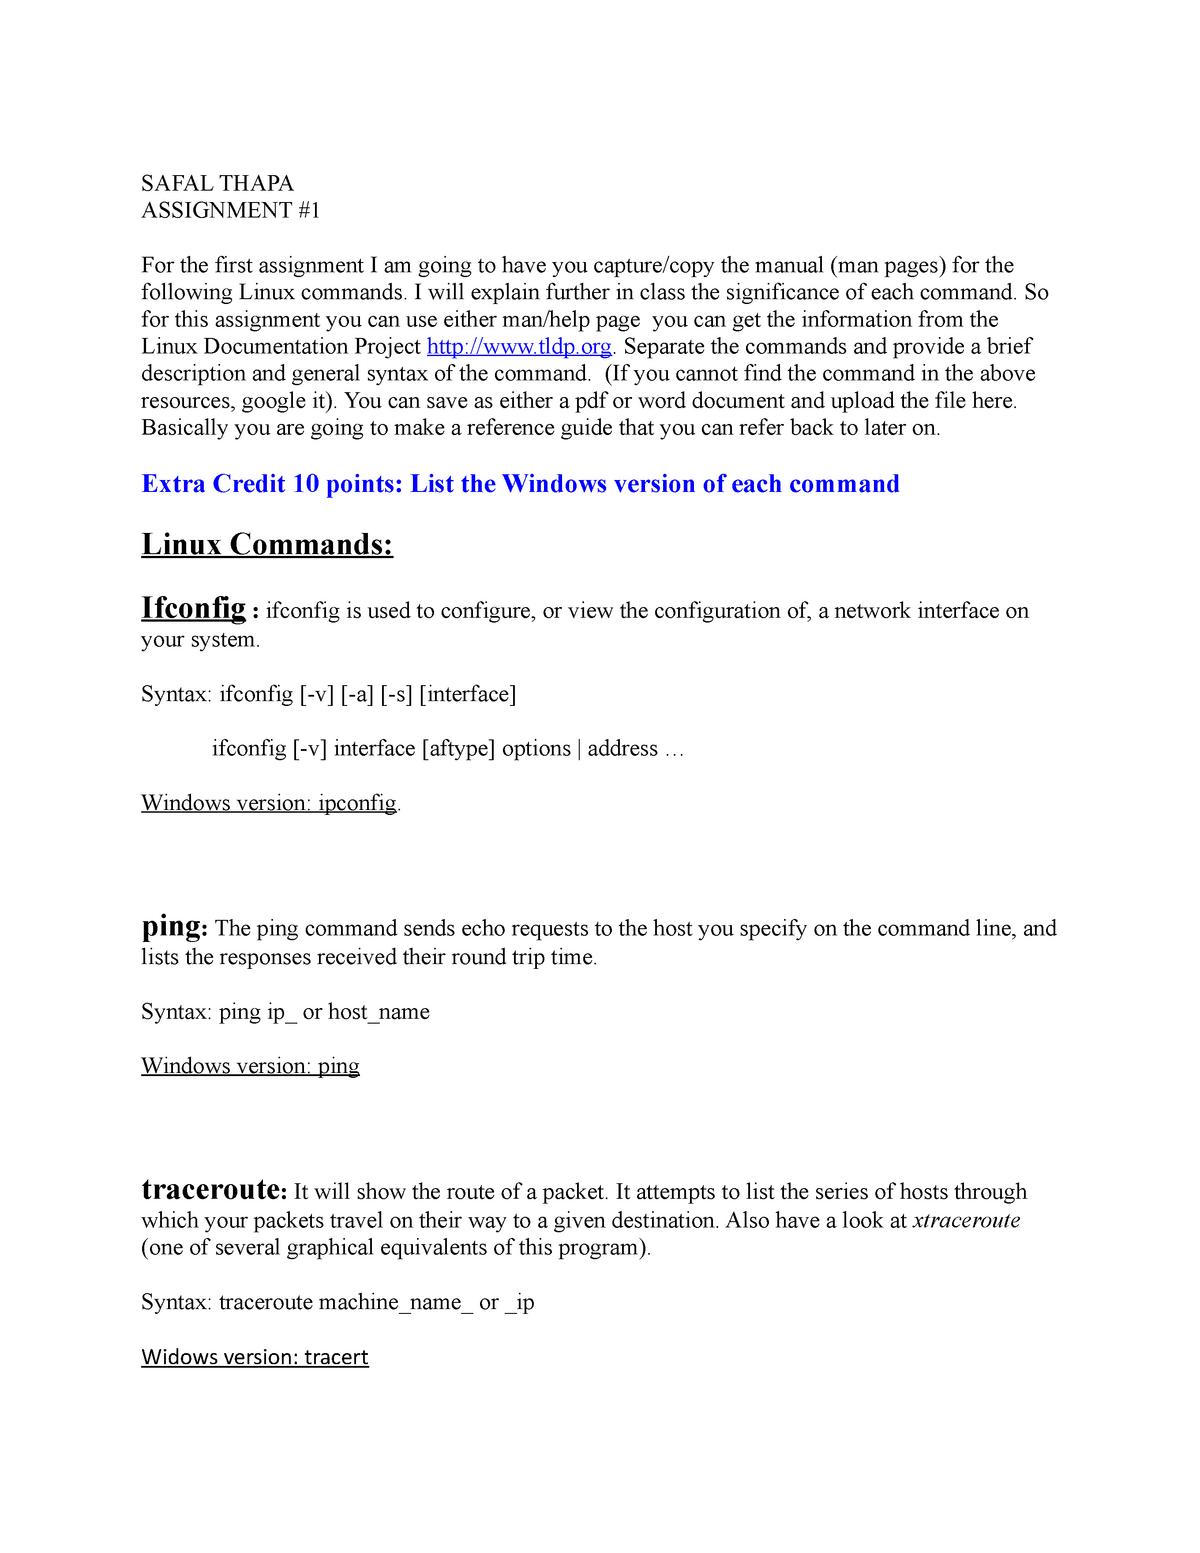 Assignment #1 - COSC 3410: Computer Security - StuDocu